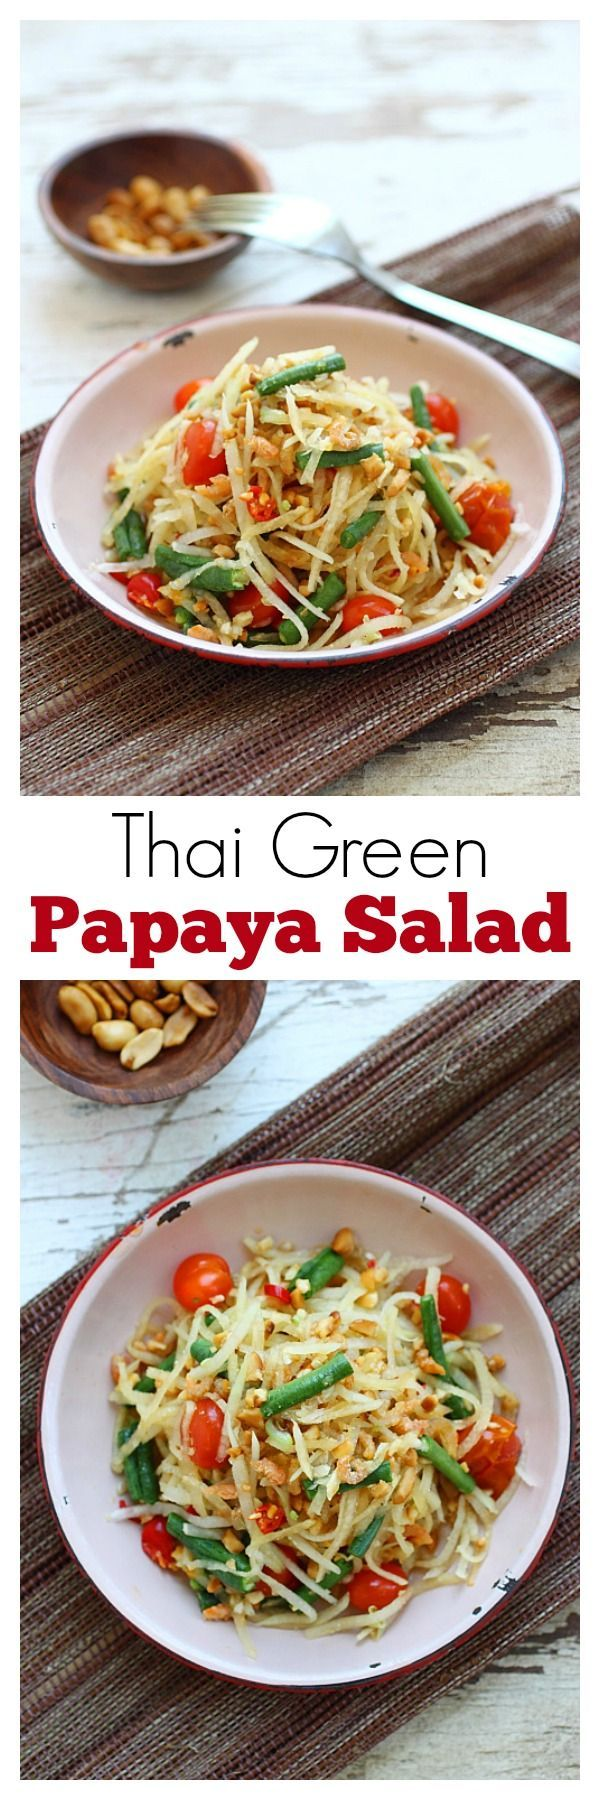 Thai green papaya salad - the best salad ever with shredded green papaya, long beans and tomatoes. So yummy   rasamalaysia.com